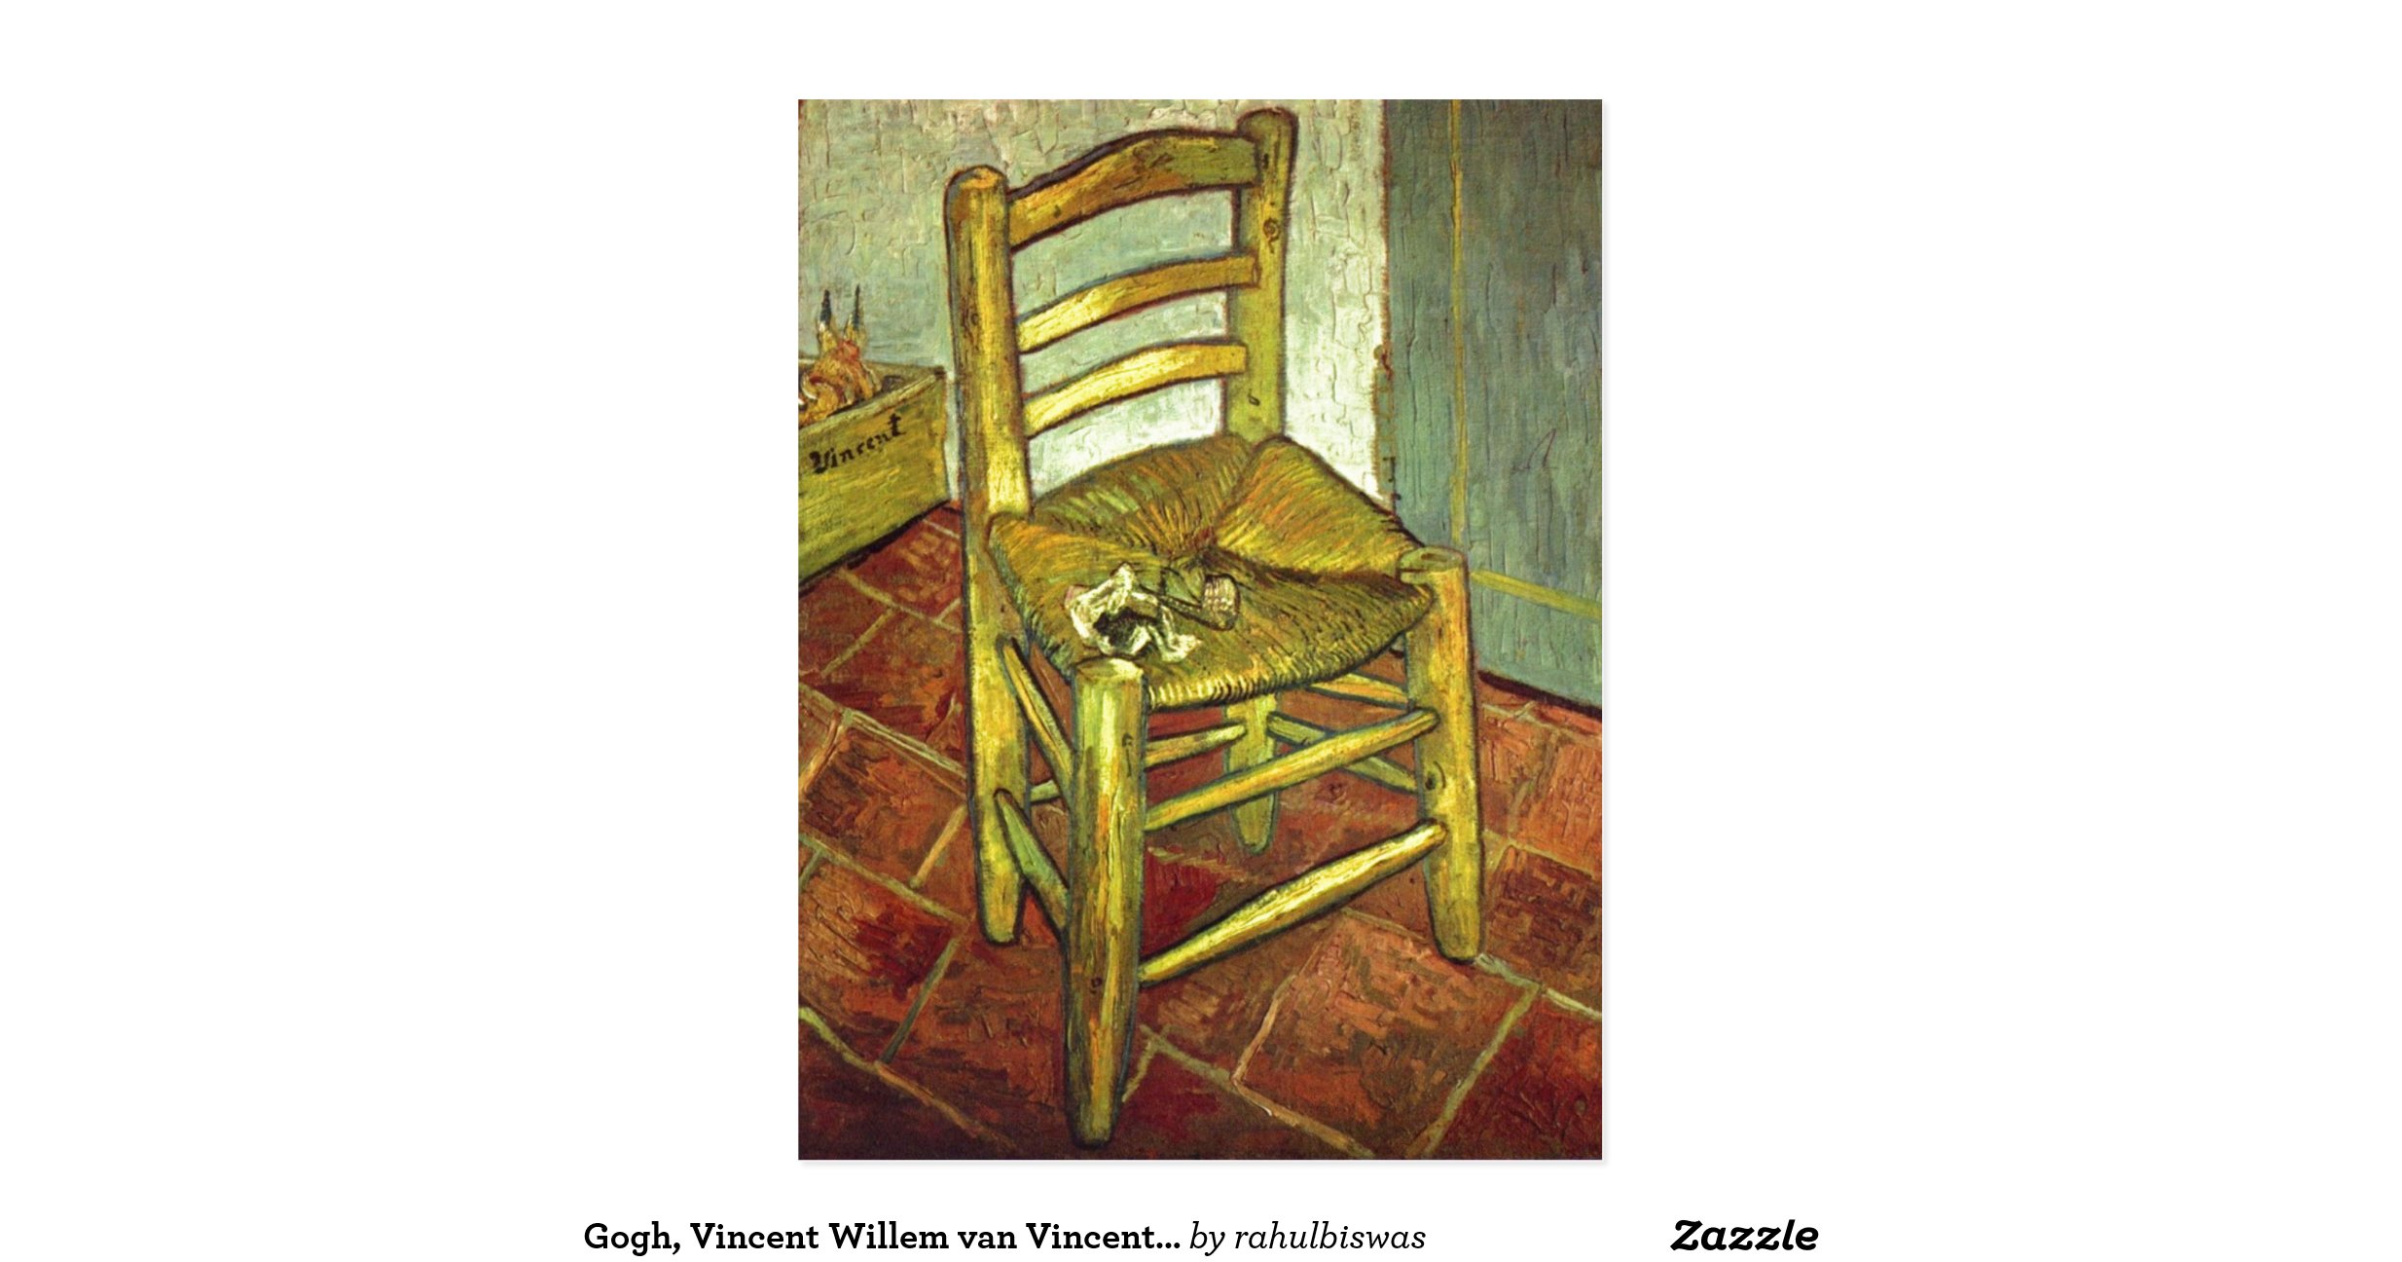 gogh vincent willem van vincents stuhl mit pfeife postcard r53093bf0a1c24e8f8df617e331468664. Black Bedroom Furniture Sets. Home Design Ideas